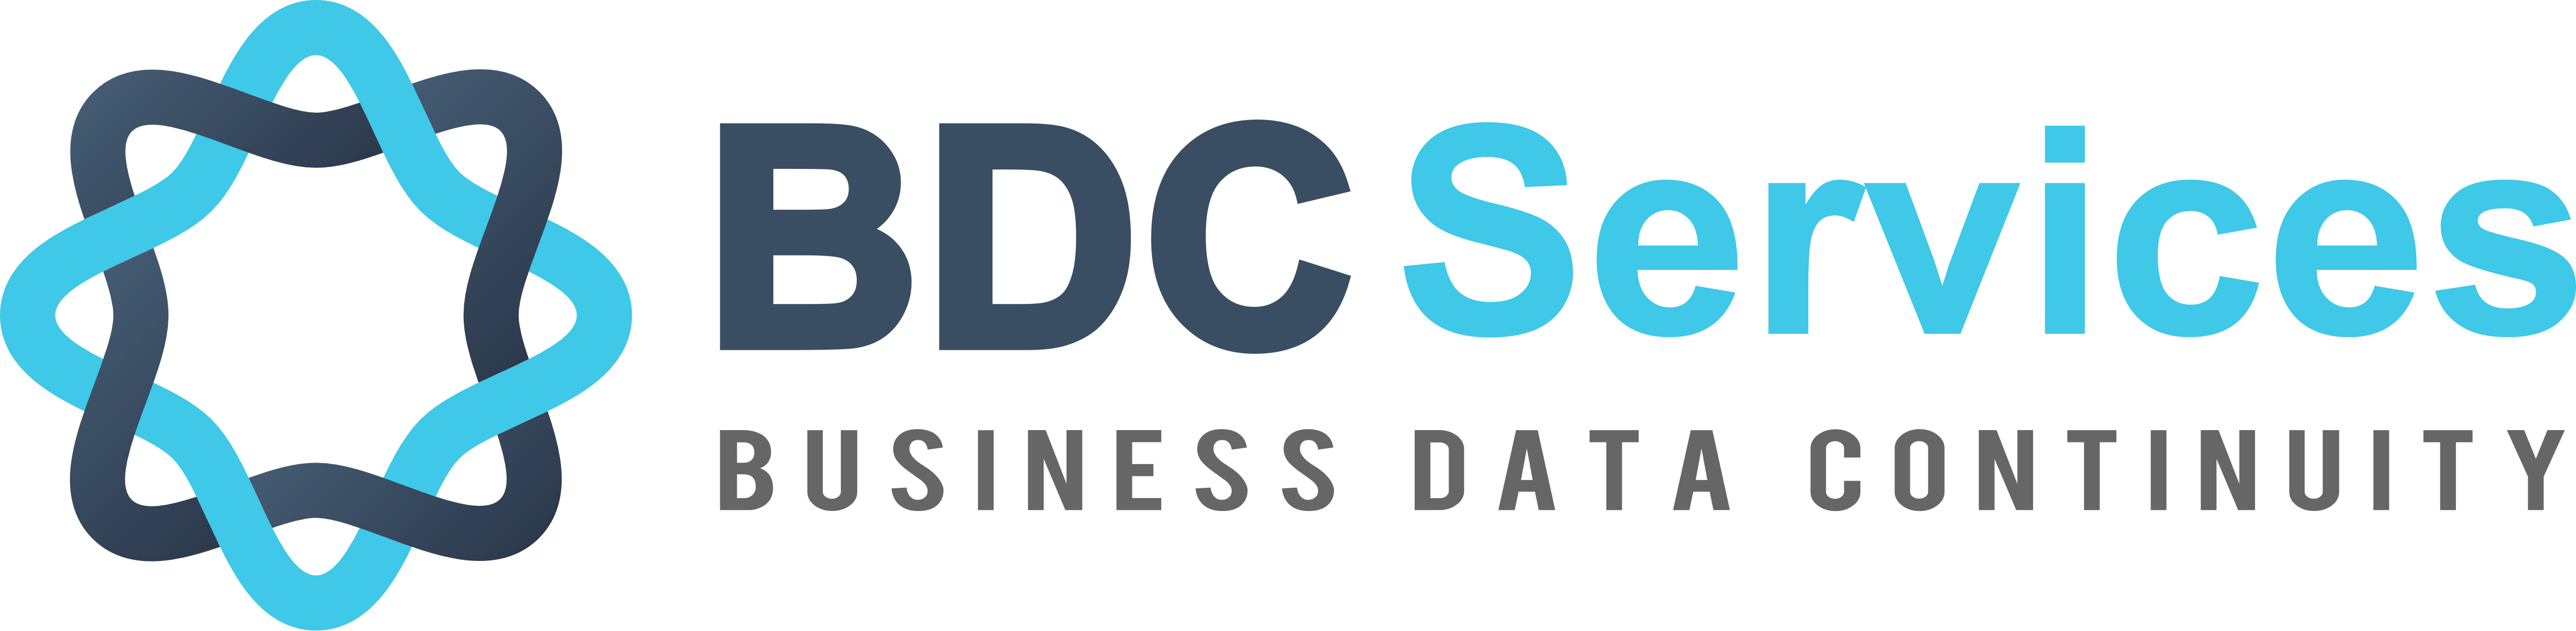 BDC Services